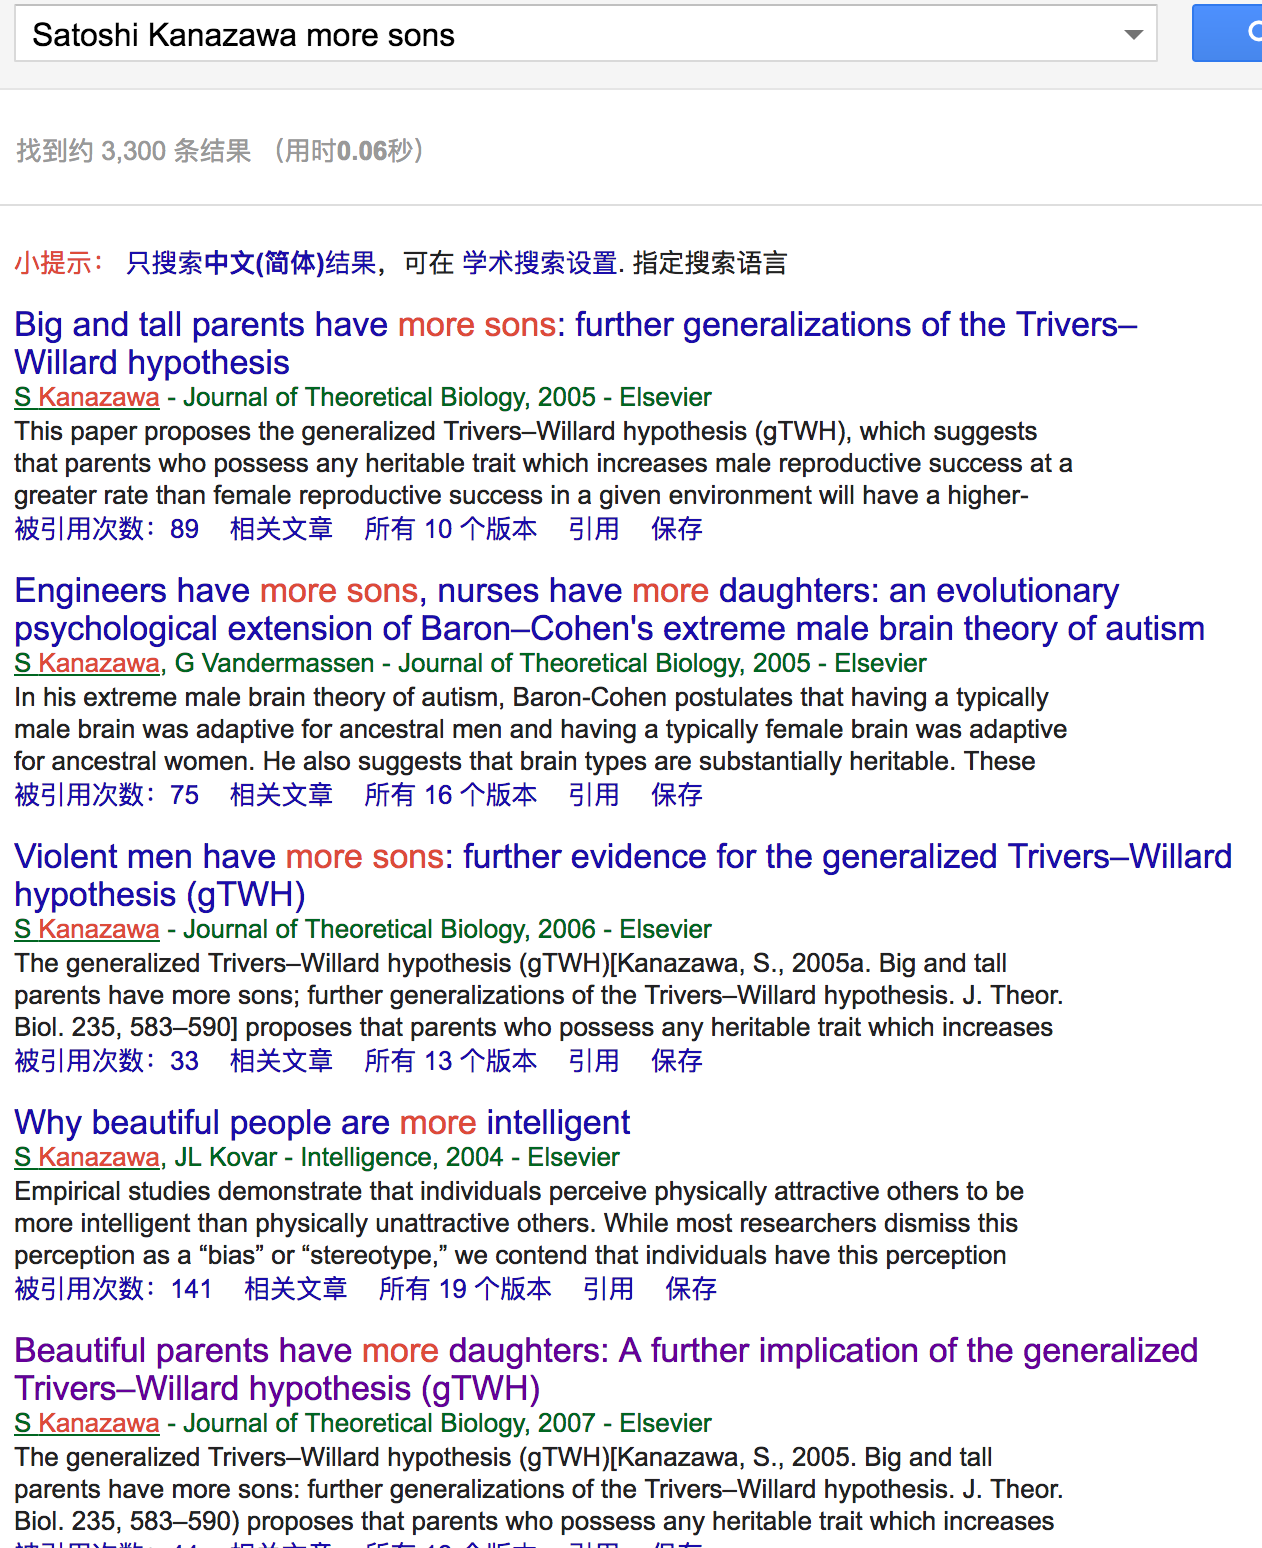 Google Scholar中Satoshi Kanazawa关于出生性别比研究的搜索结果